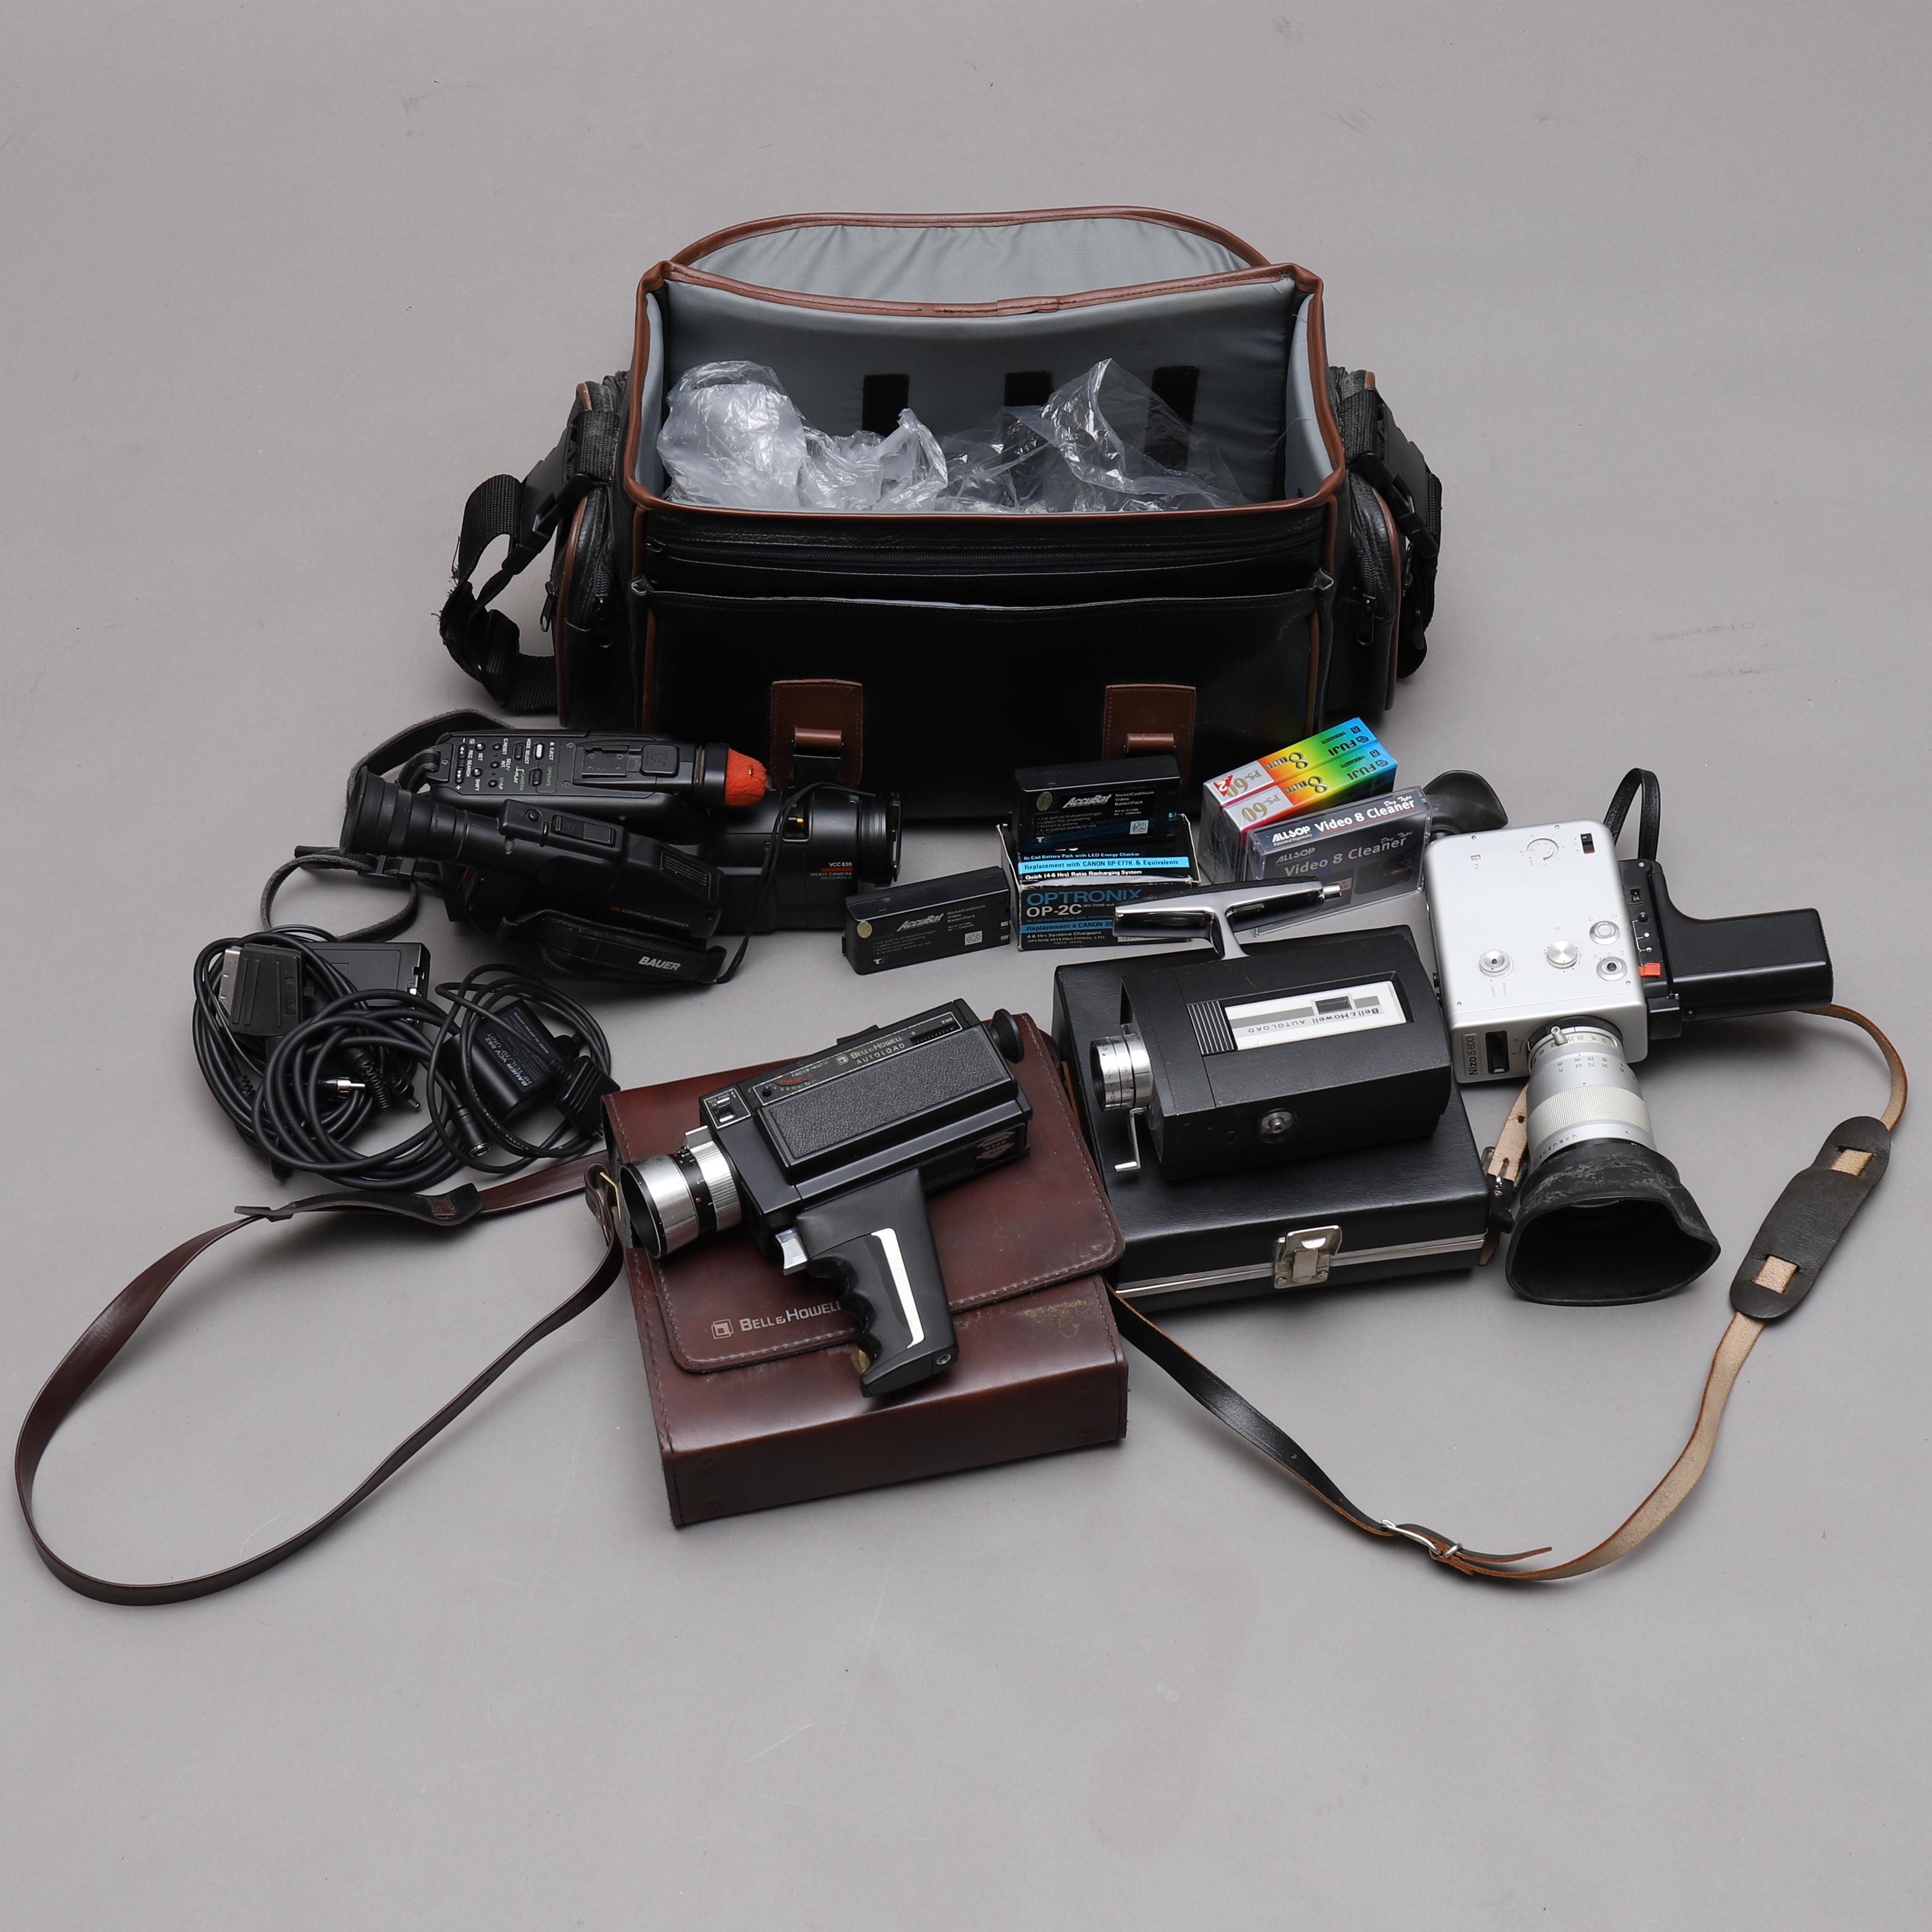 FILMKAMEROR, 4 st, Nizo, Bell Howell, Bauer  Photo, Cameras